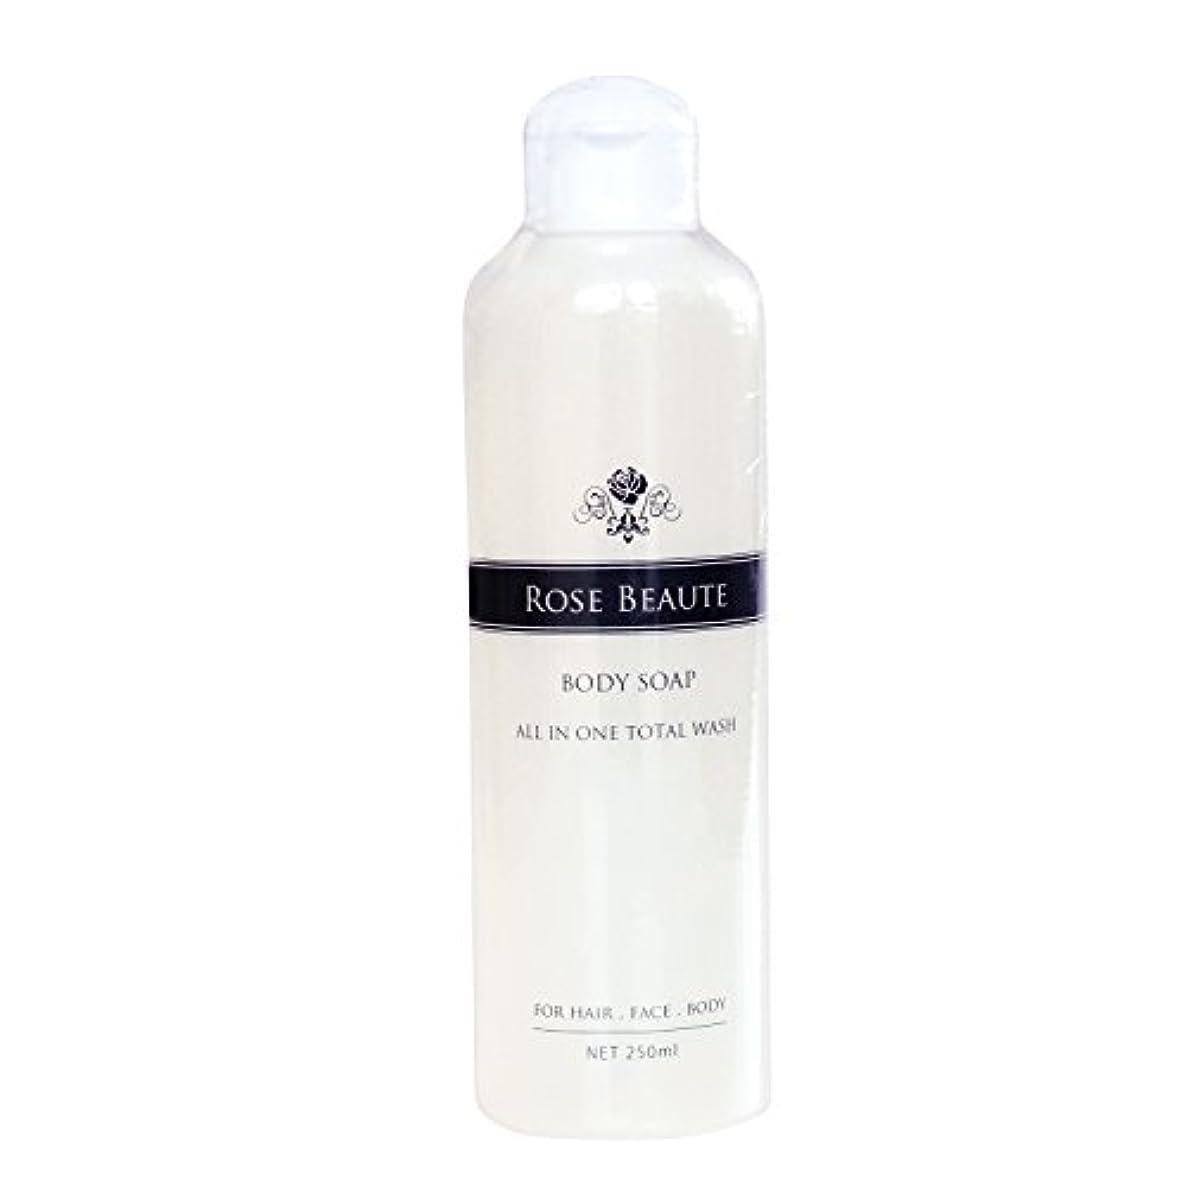 Rose Beaute(ロサボーテ) 無添加 ノンシリコン ボディーソープ (髪?顔?からだ用) ボトル 250ml 全身シャンプー 日本製